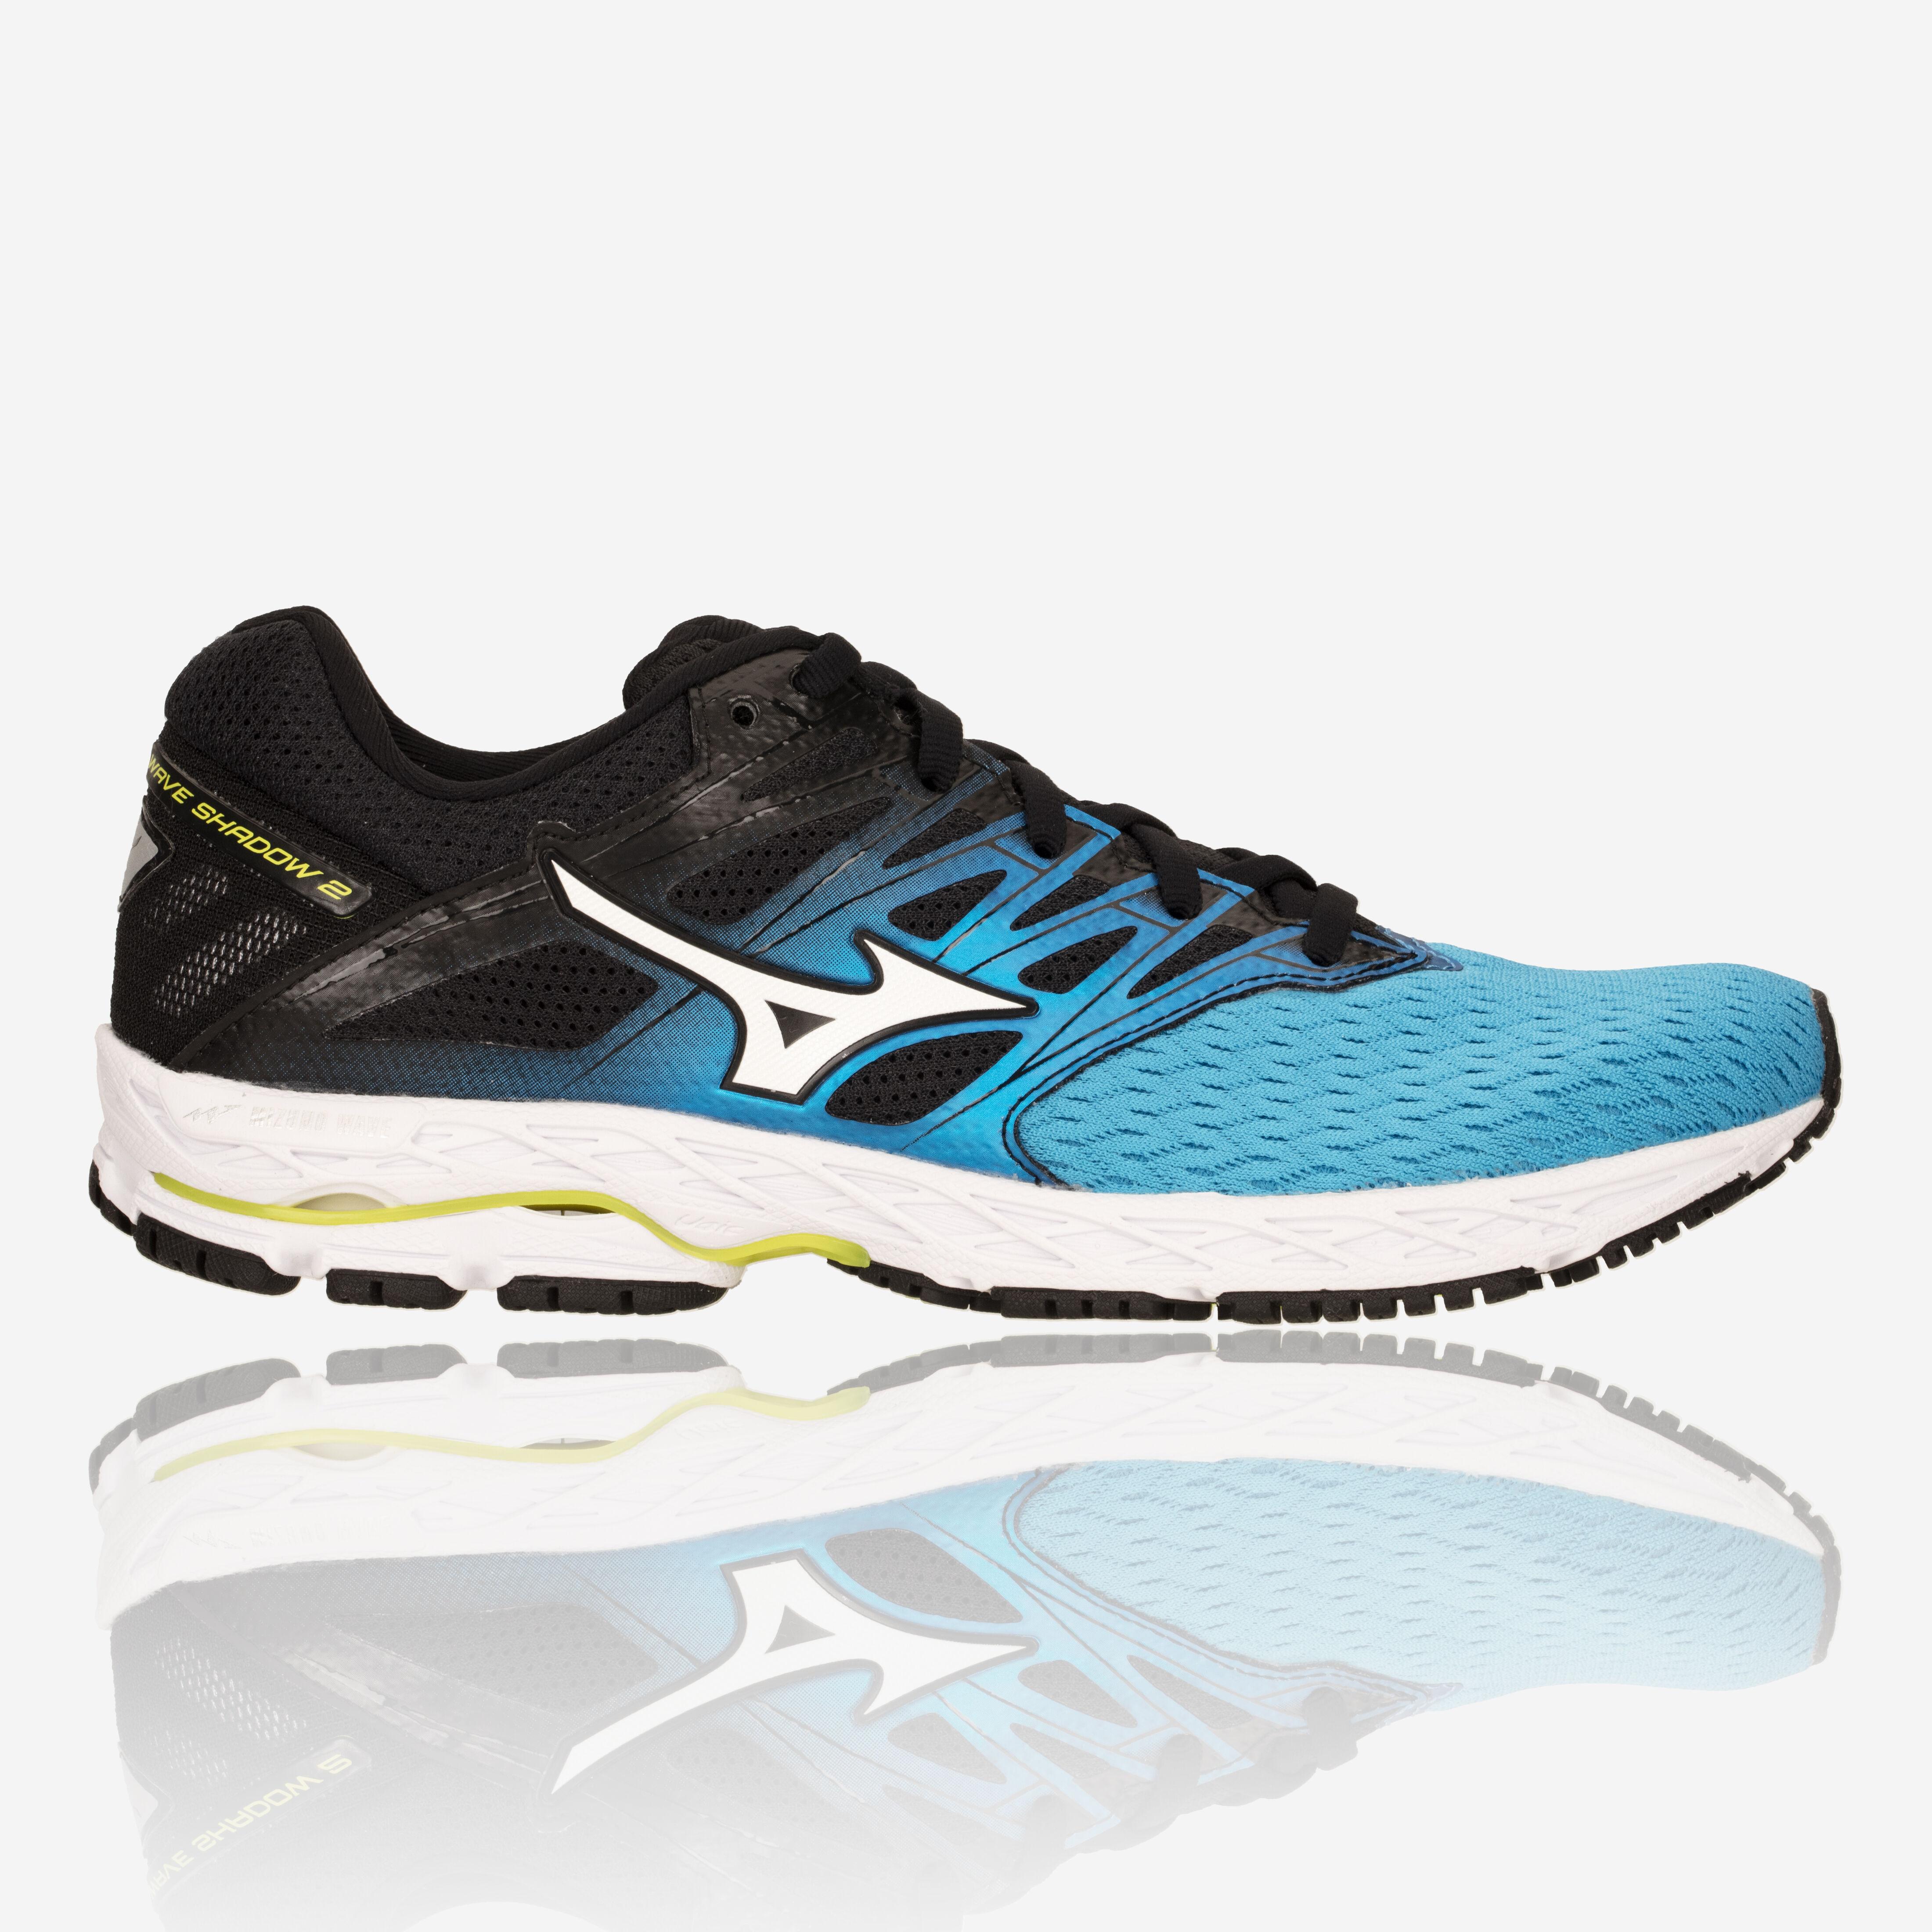 76f1d614d404 Mizuno Wave Shadow 2 shoes 2019 RUNKD online running store